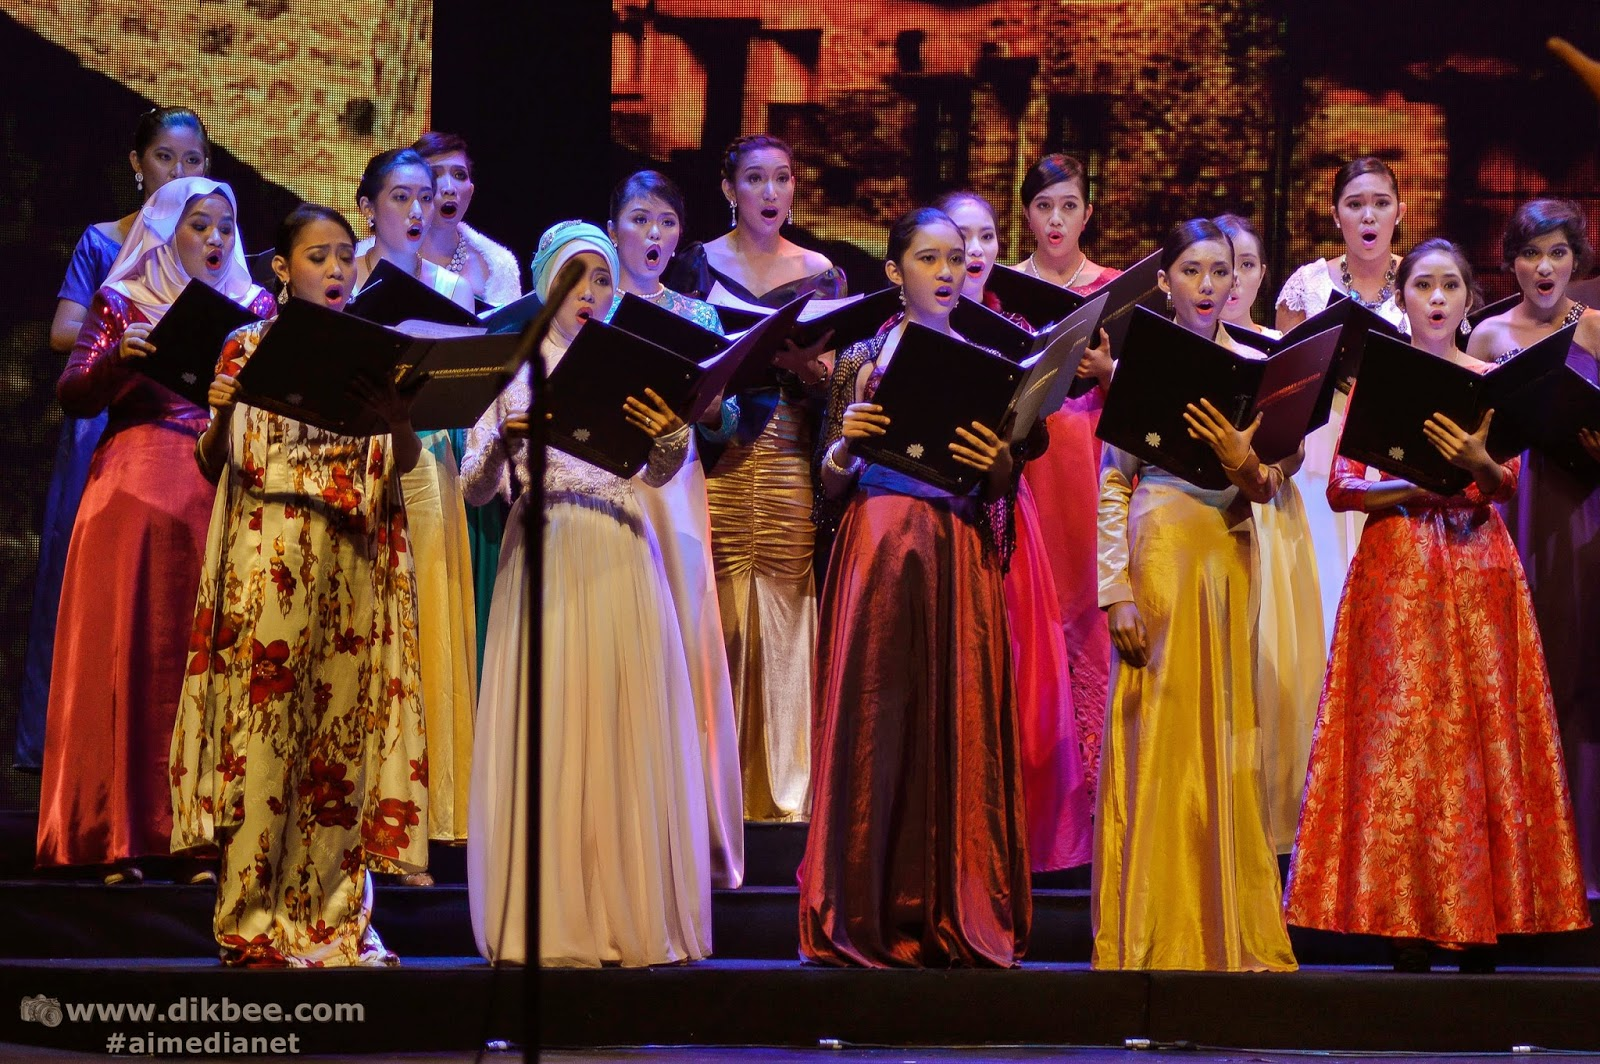 Konsert Koir Kebangsaan Malaysia Classique